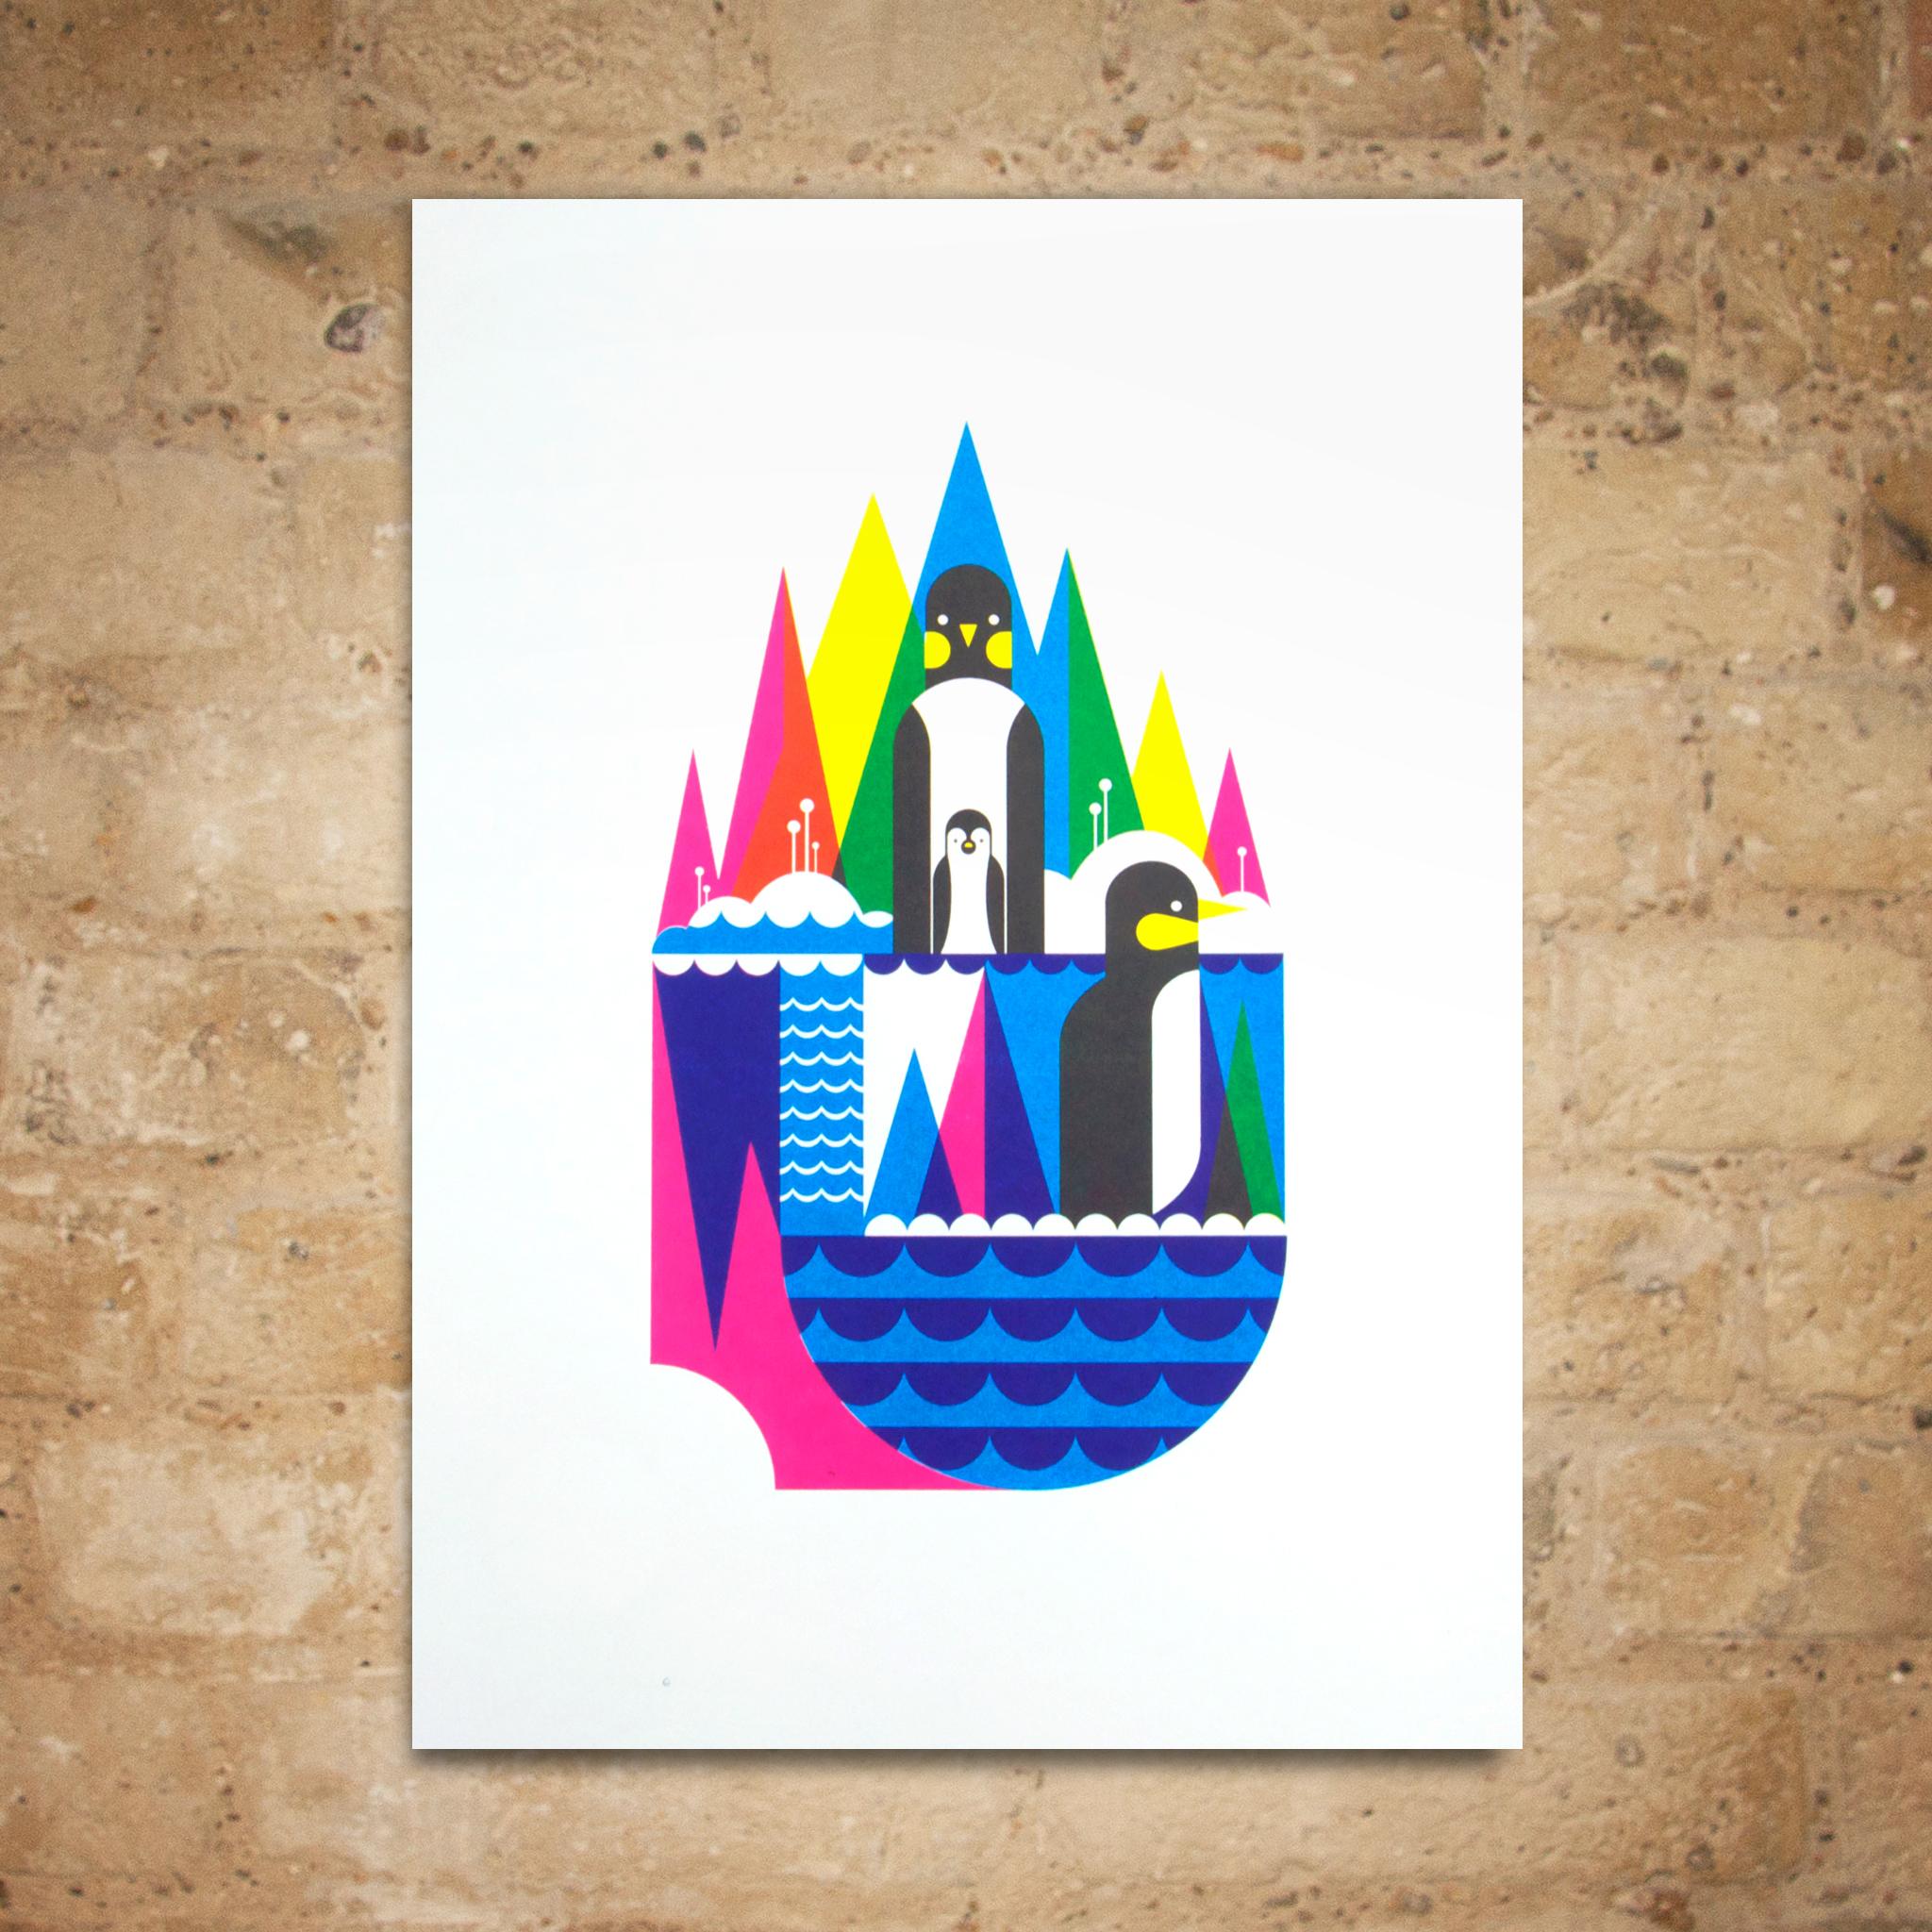 Penguins Print by Patrick Hruby